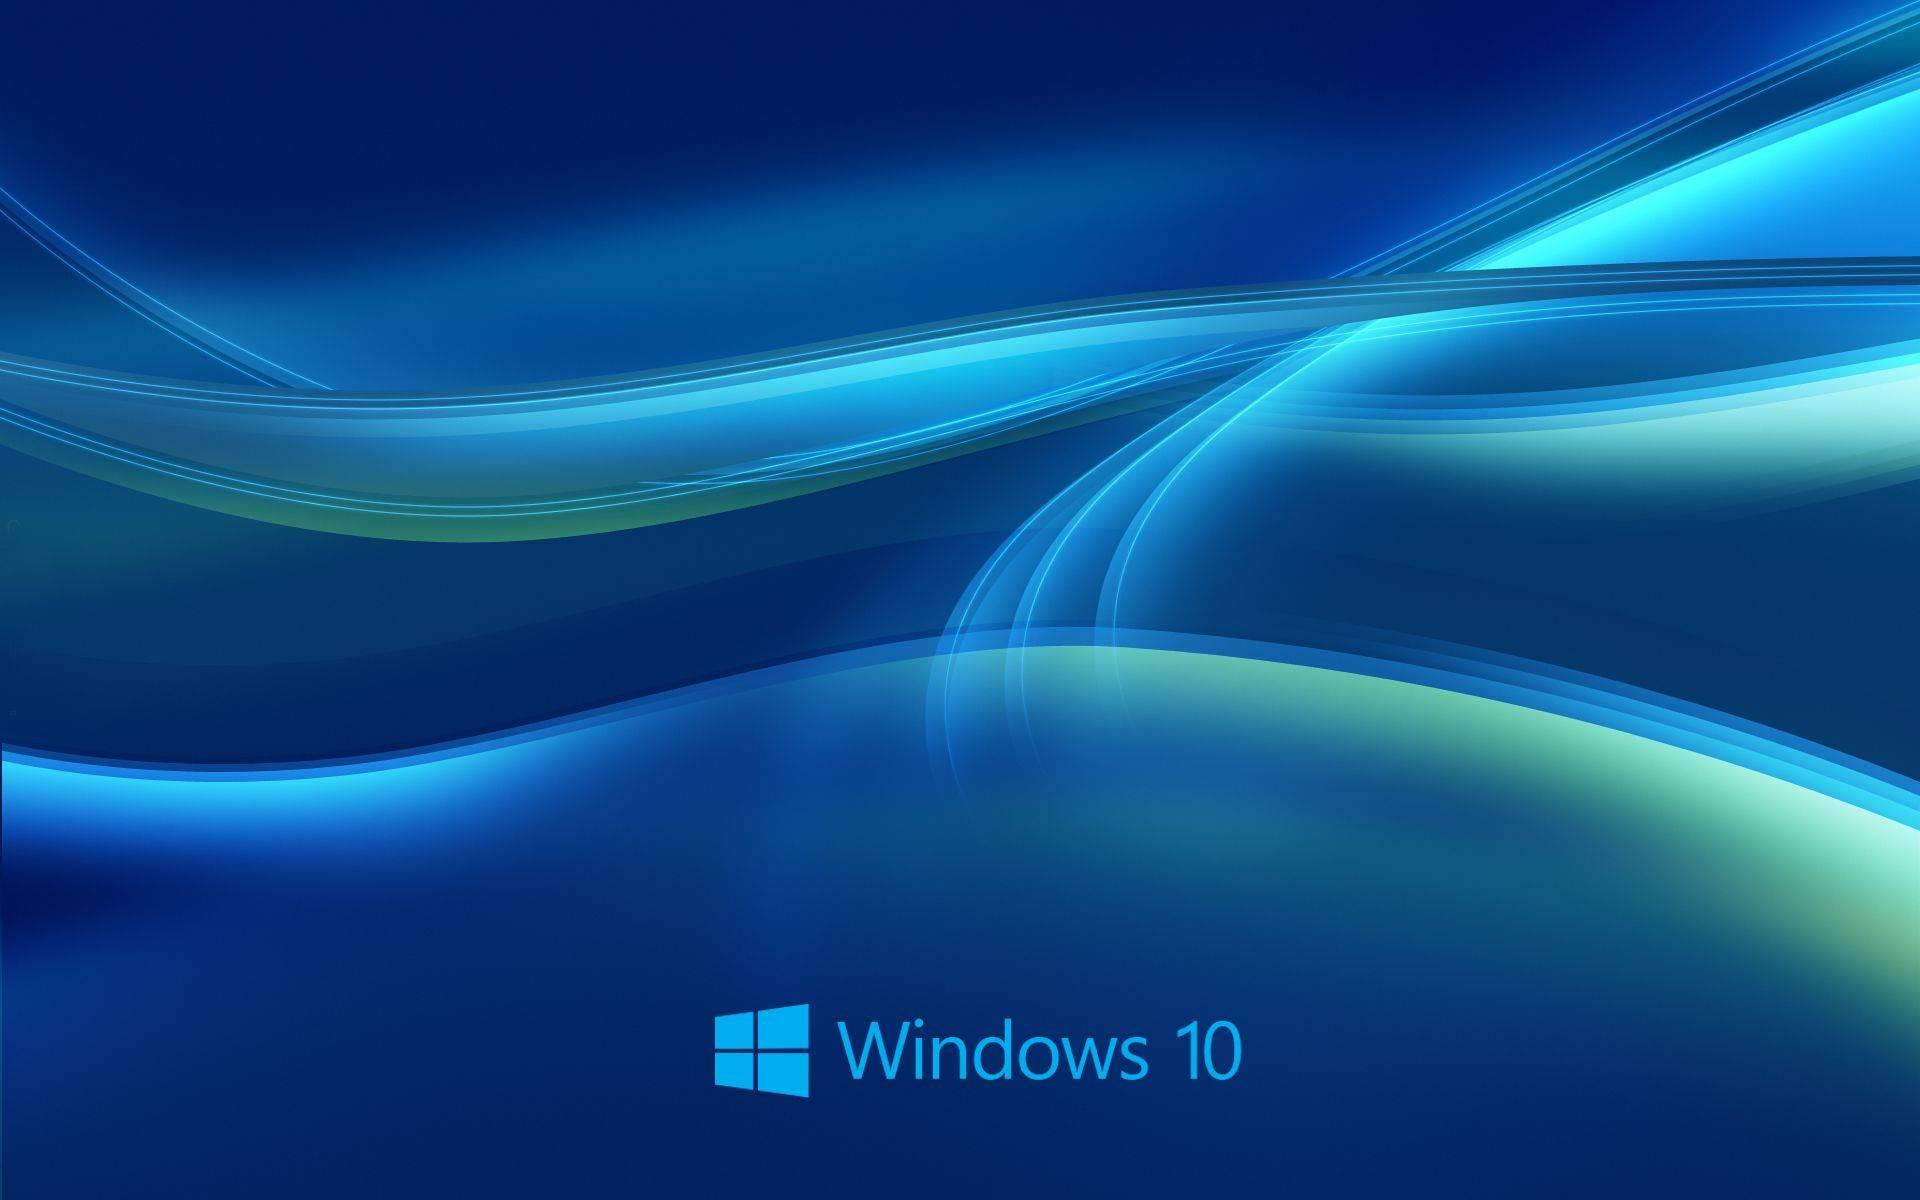 Windows 10 Wallpaper 57